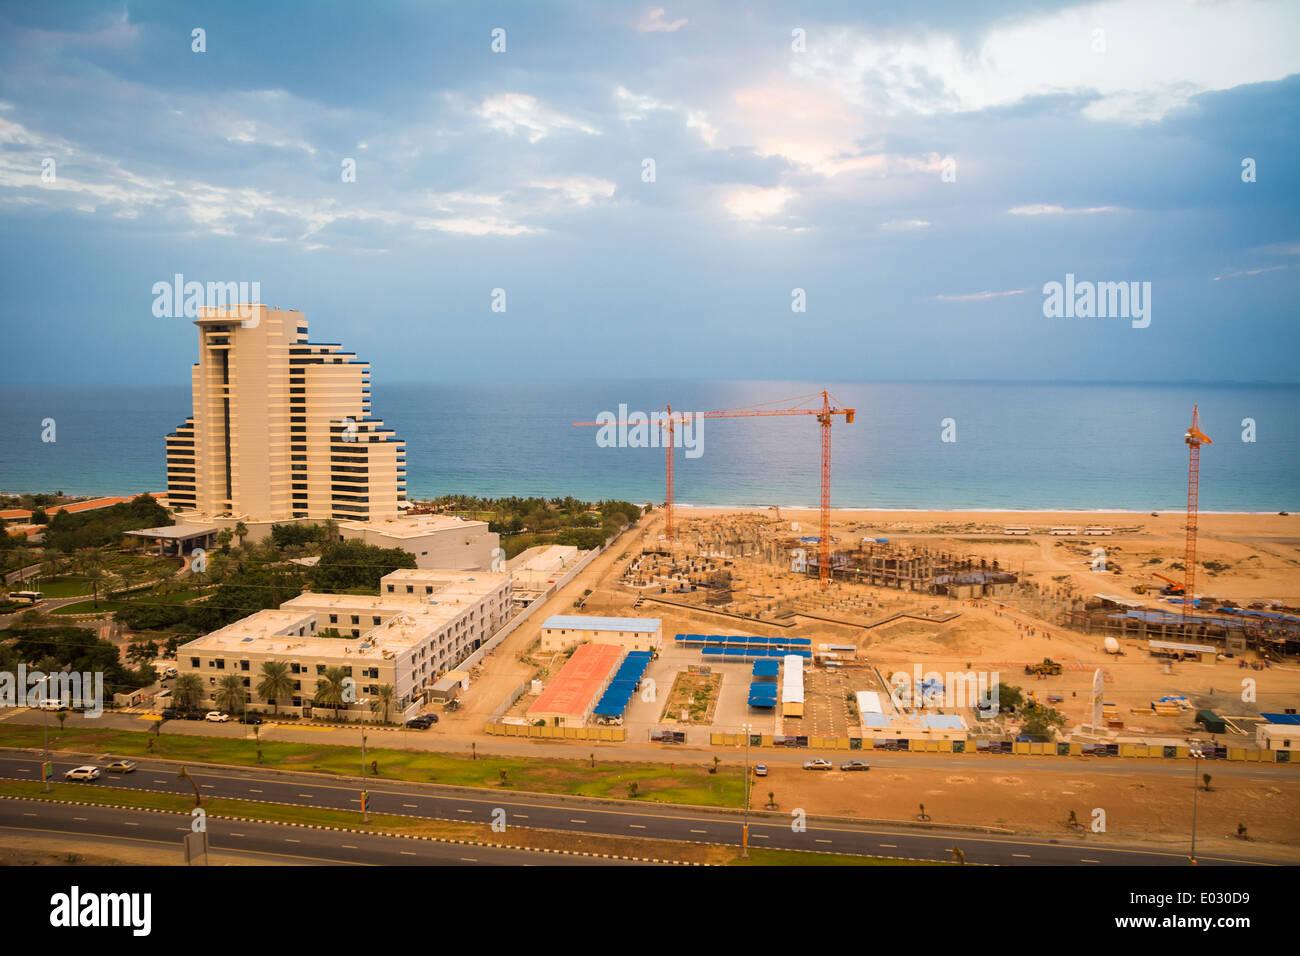 Le Meridien Hotel Al Aqah Beach Resort and construction of a new hotel. Fujairah, UAE Stock Photo